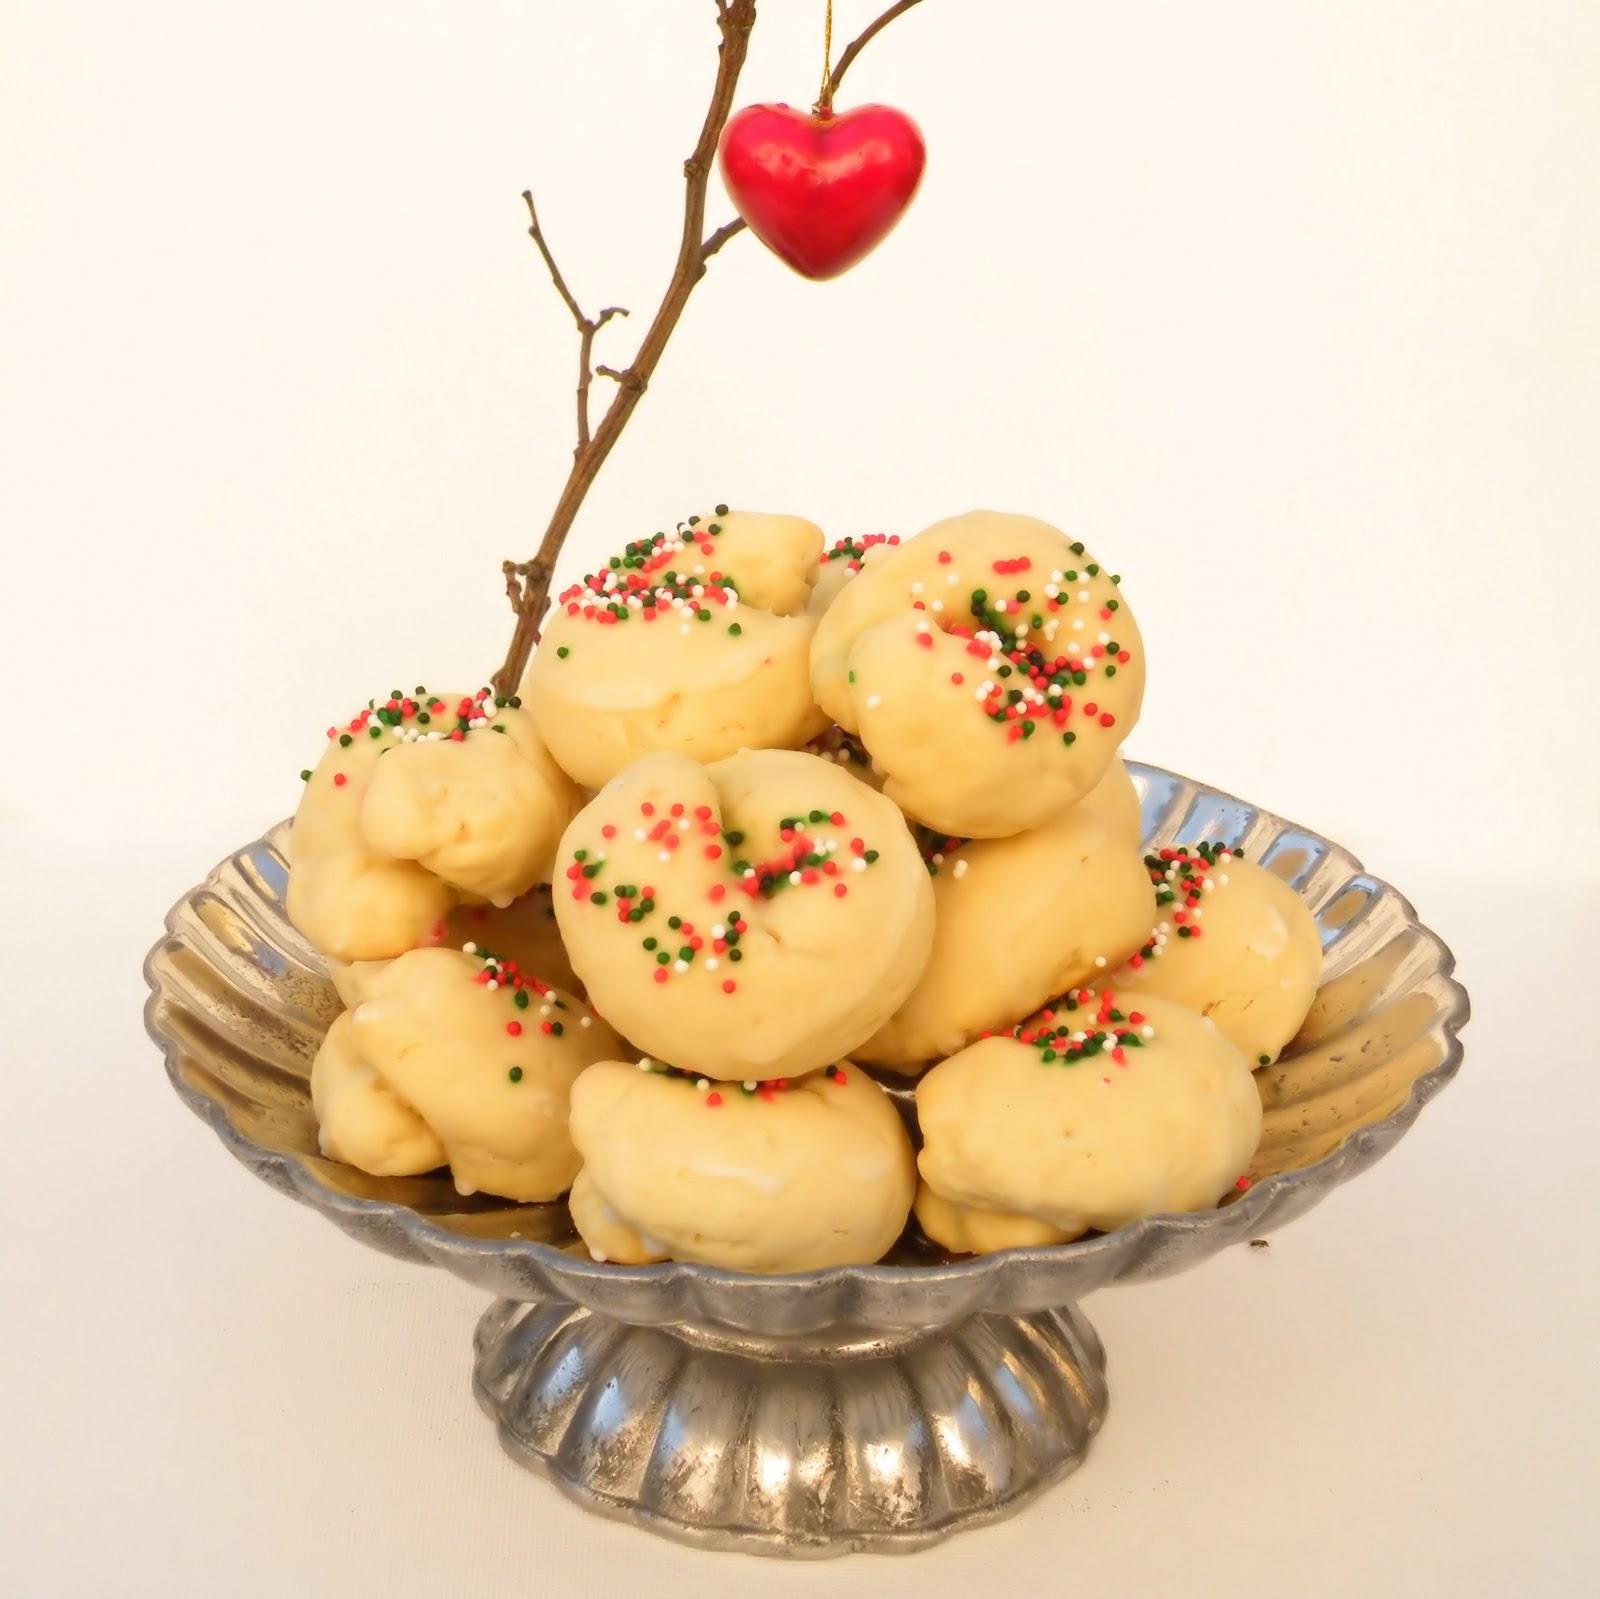 italian knot cookies - Italian Christmas Cookies Anise